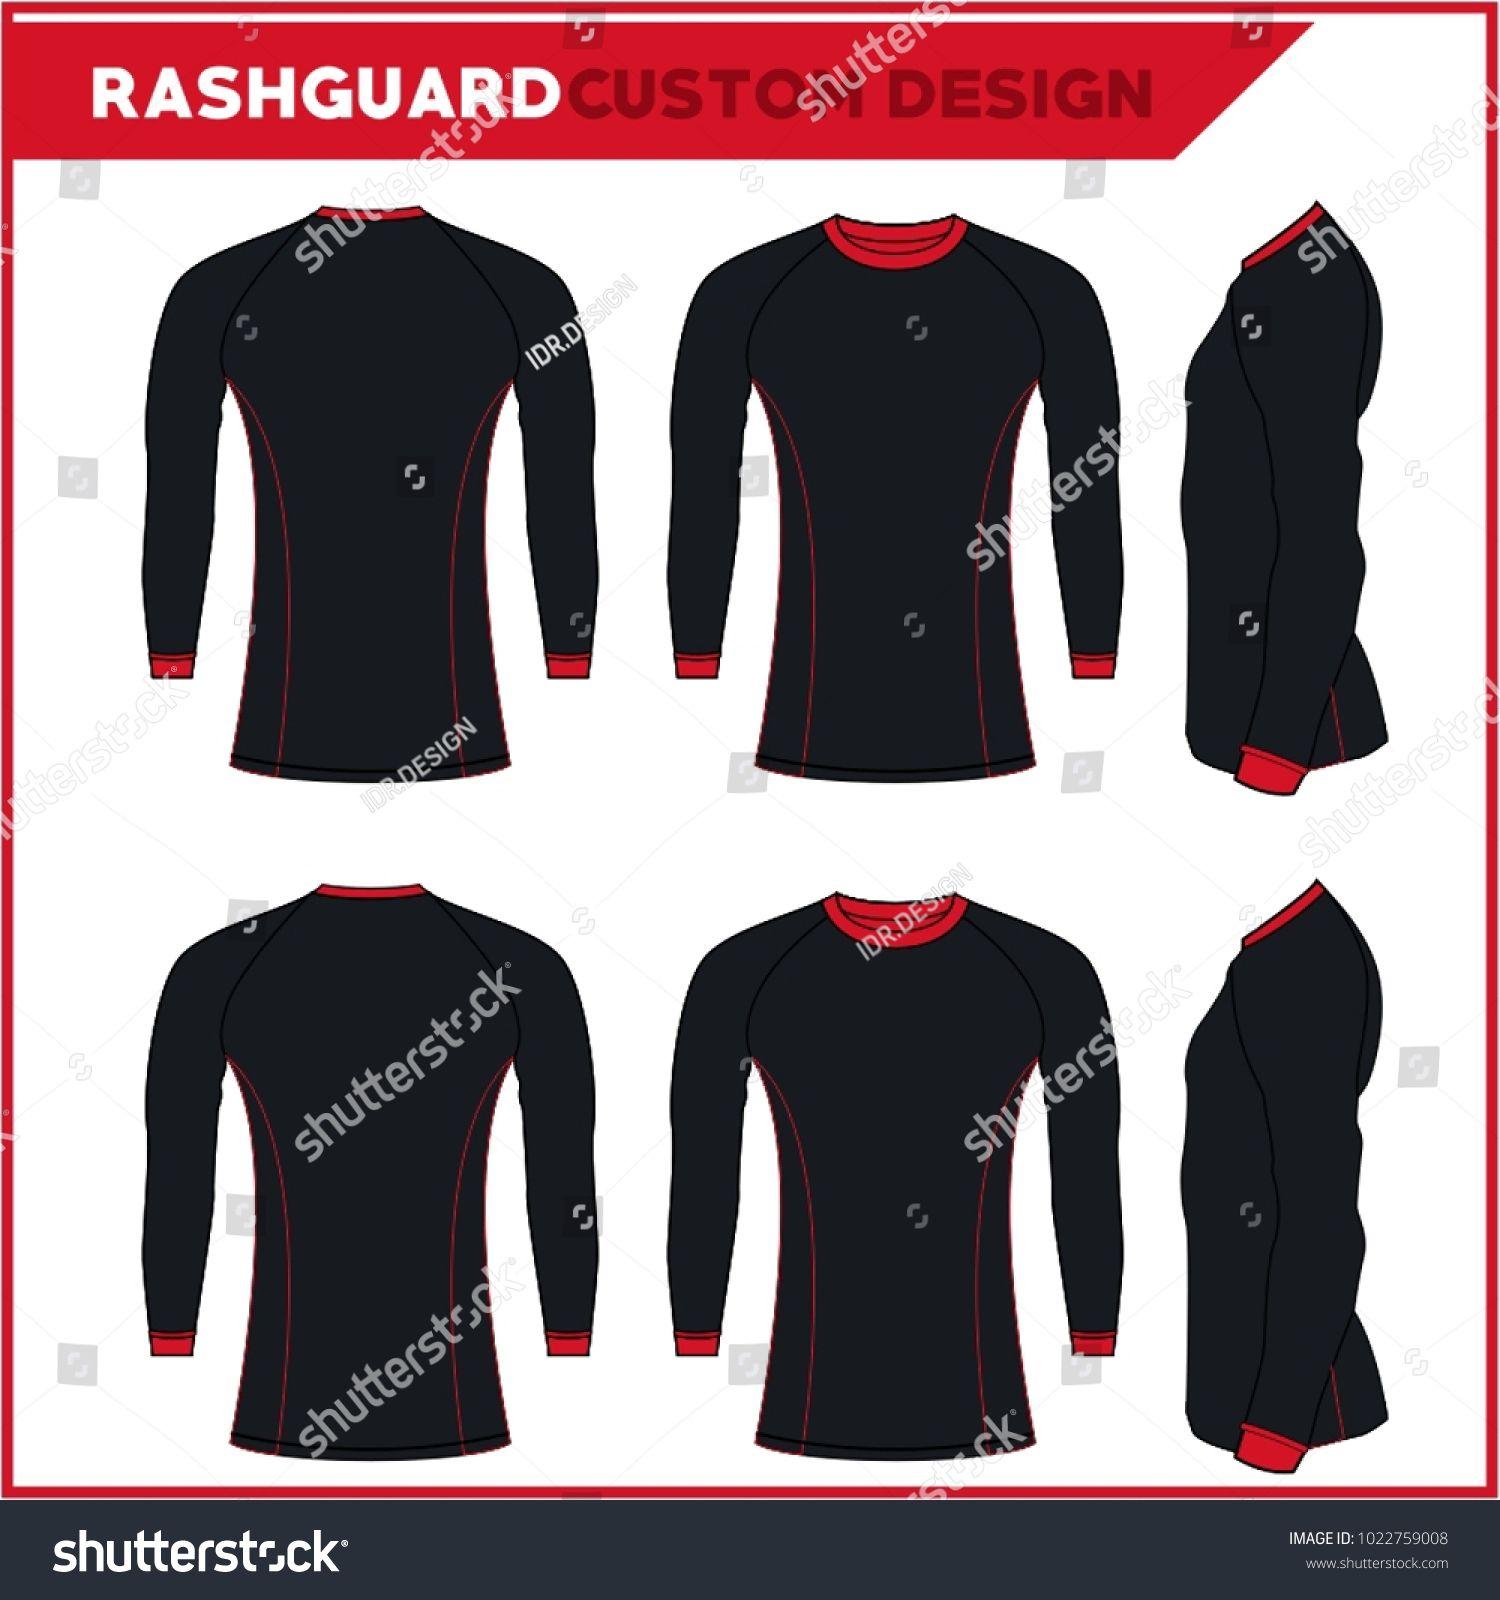 Rash Guards Template Design Rash Guard Jiu Jitsu Custom Design